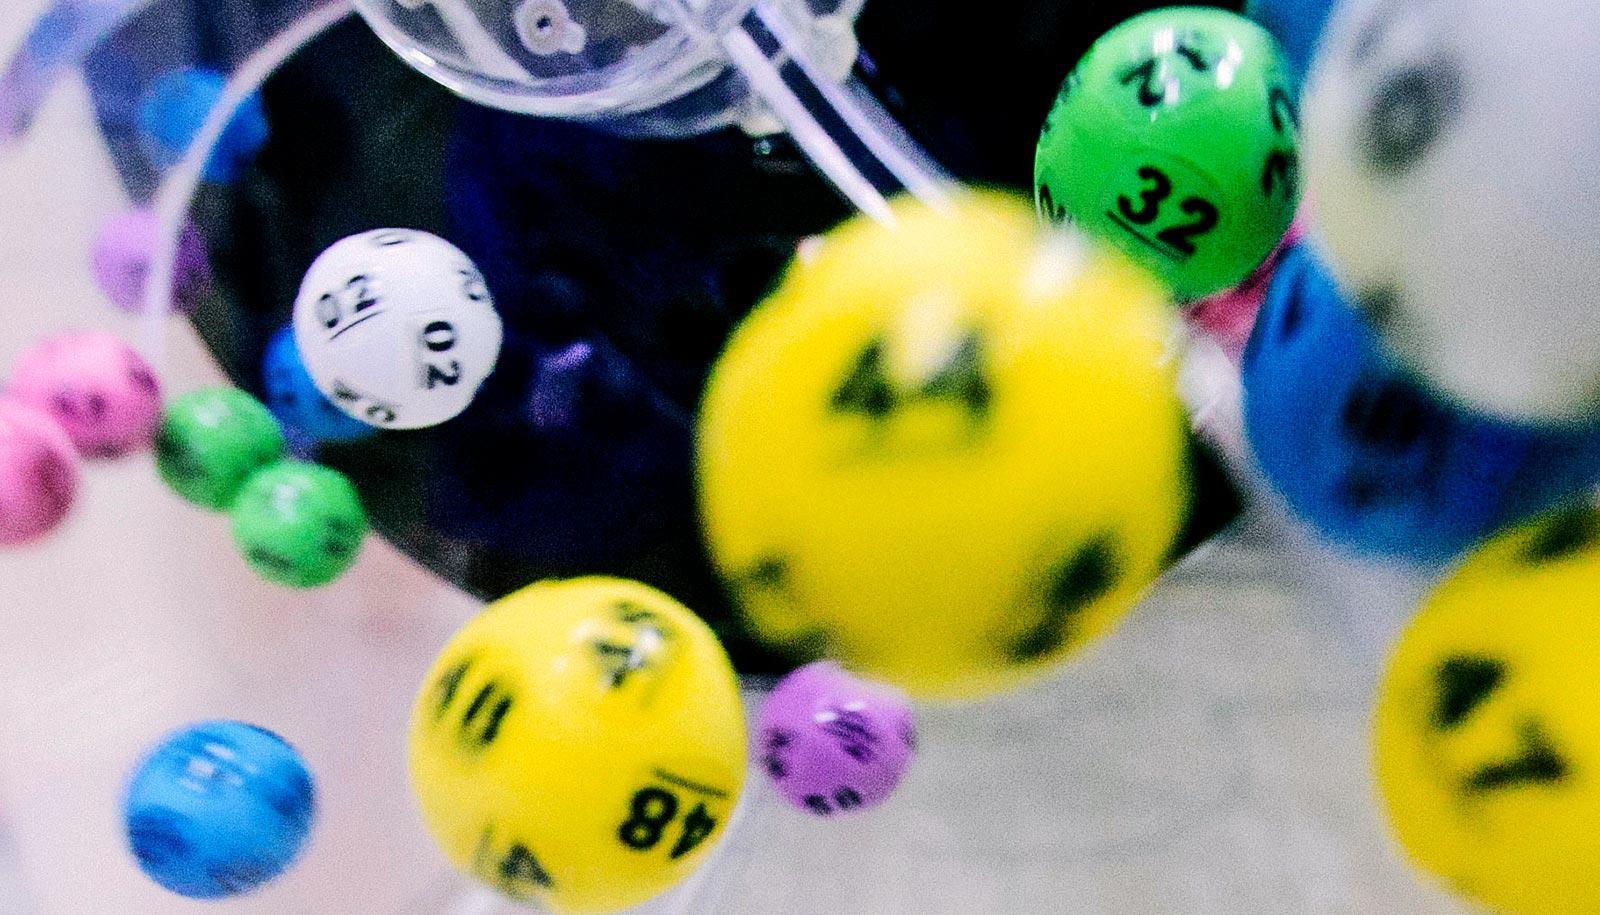 lottery balls (stem cells concept)